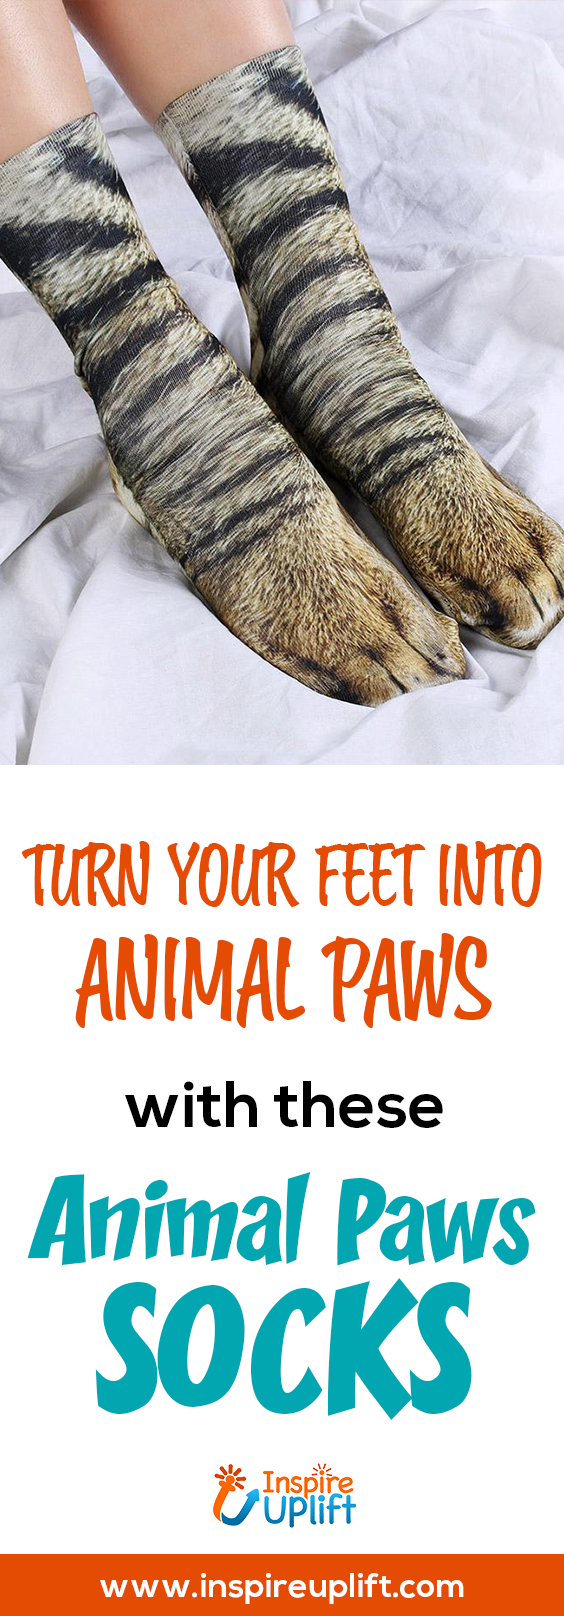 Animal Paws Socks 😍 InspireUplift.com